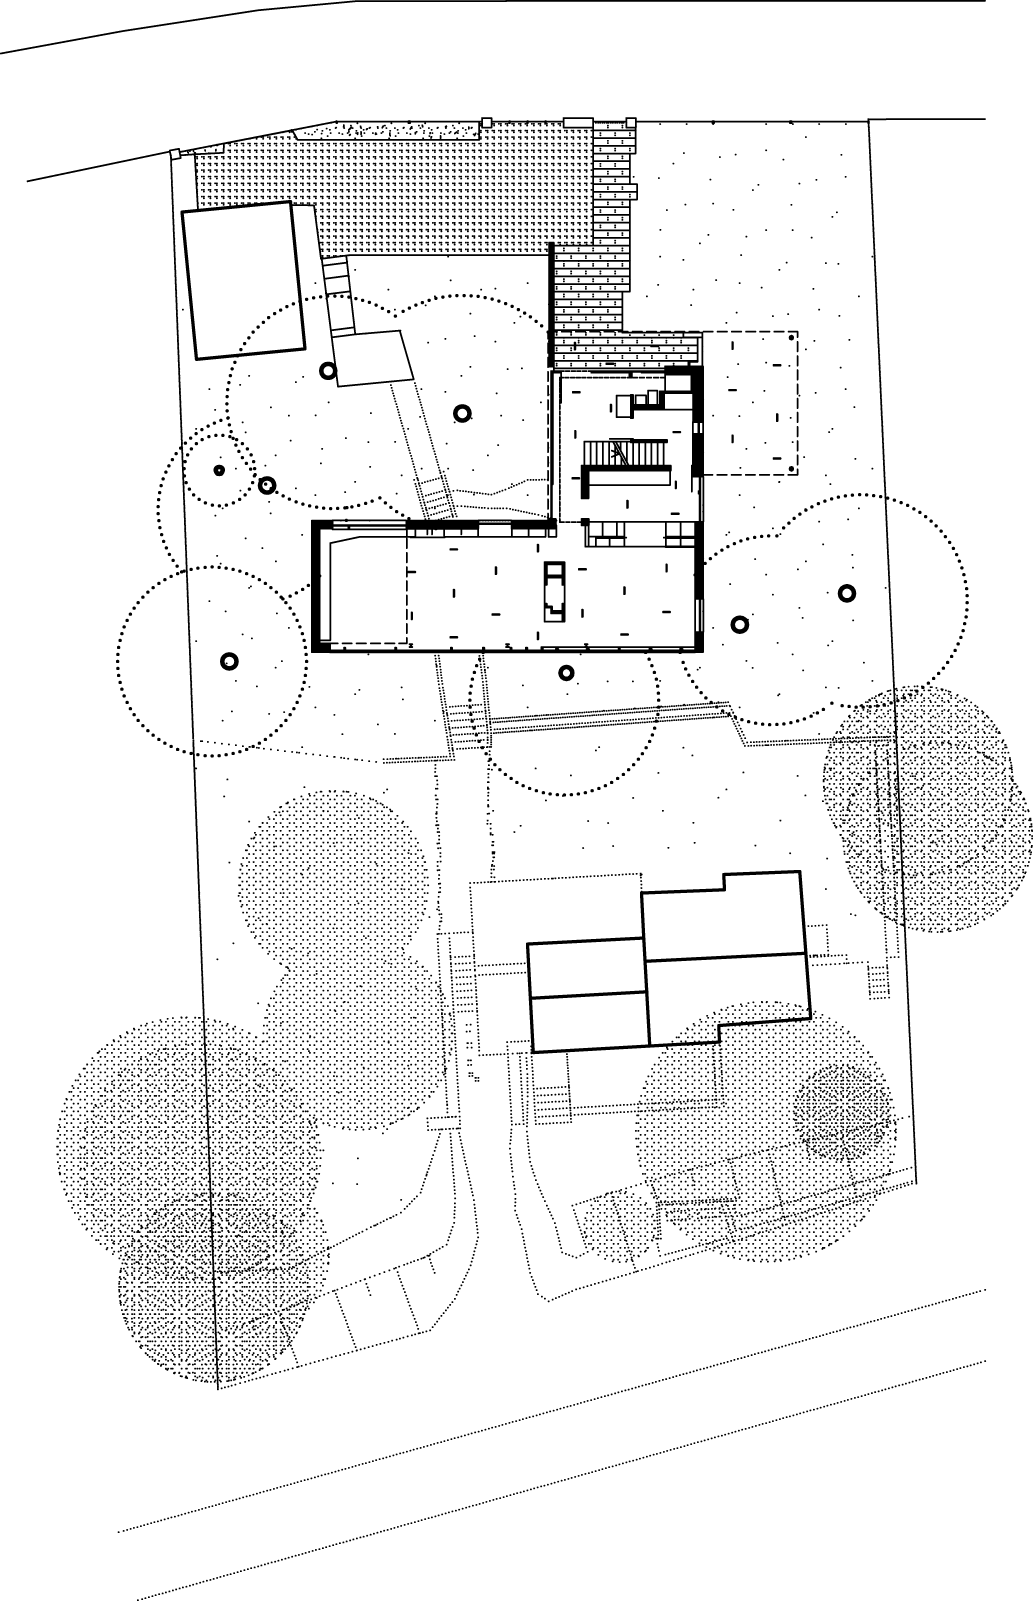 Einfamilienhaus Haus P3, Potsdam: Lageplan / Grundriss Erdgeschoss